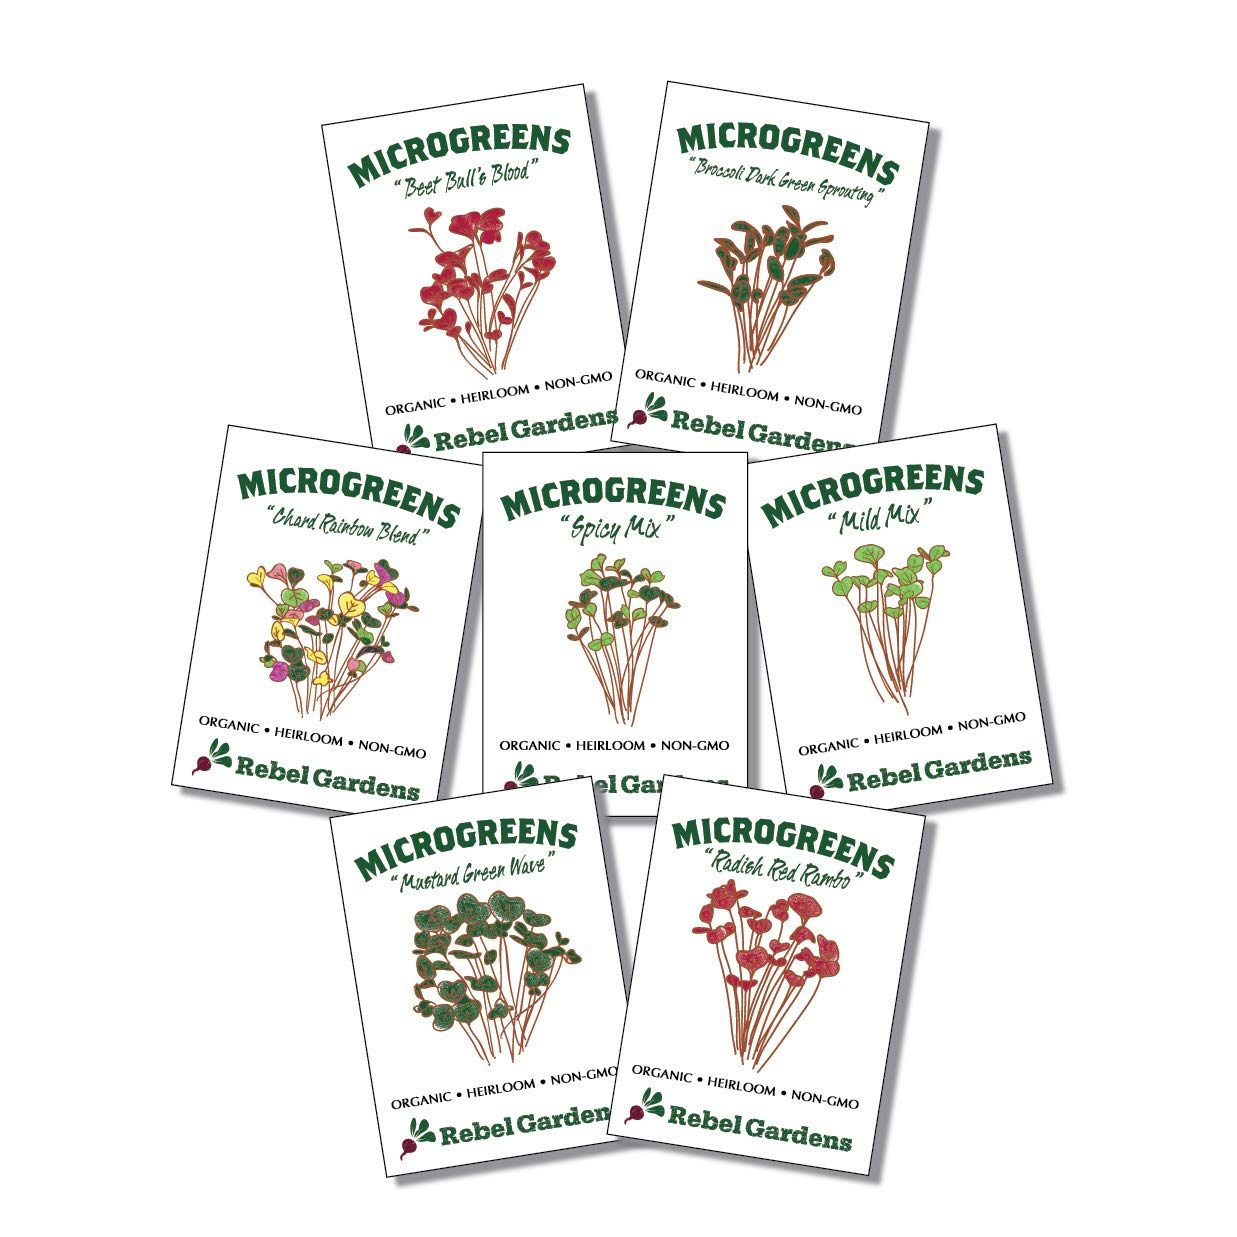 Microgreen Seeds Organic Mix - Microgreens Growing Kit - 7 Non GMO Varieties - Broccoli Raddish Mild Mix Spicy Mix and More